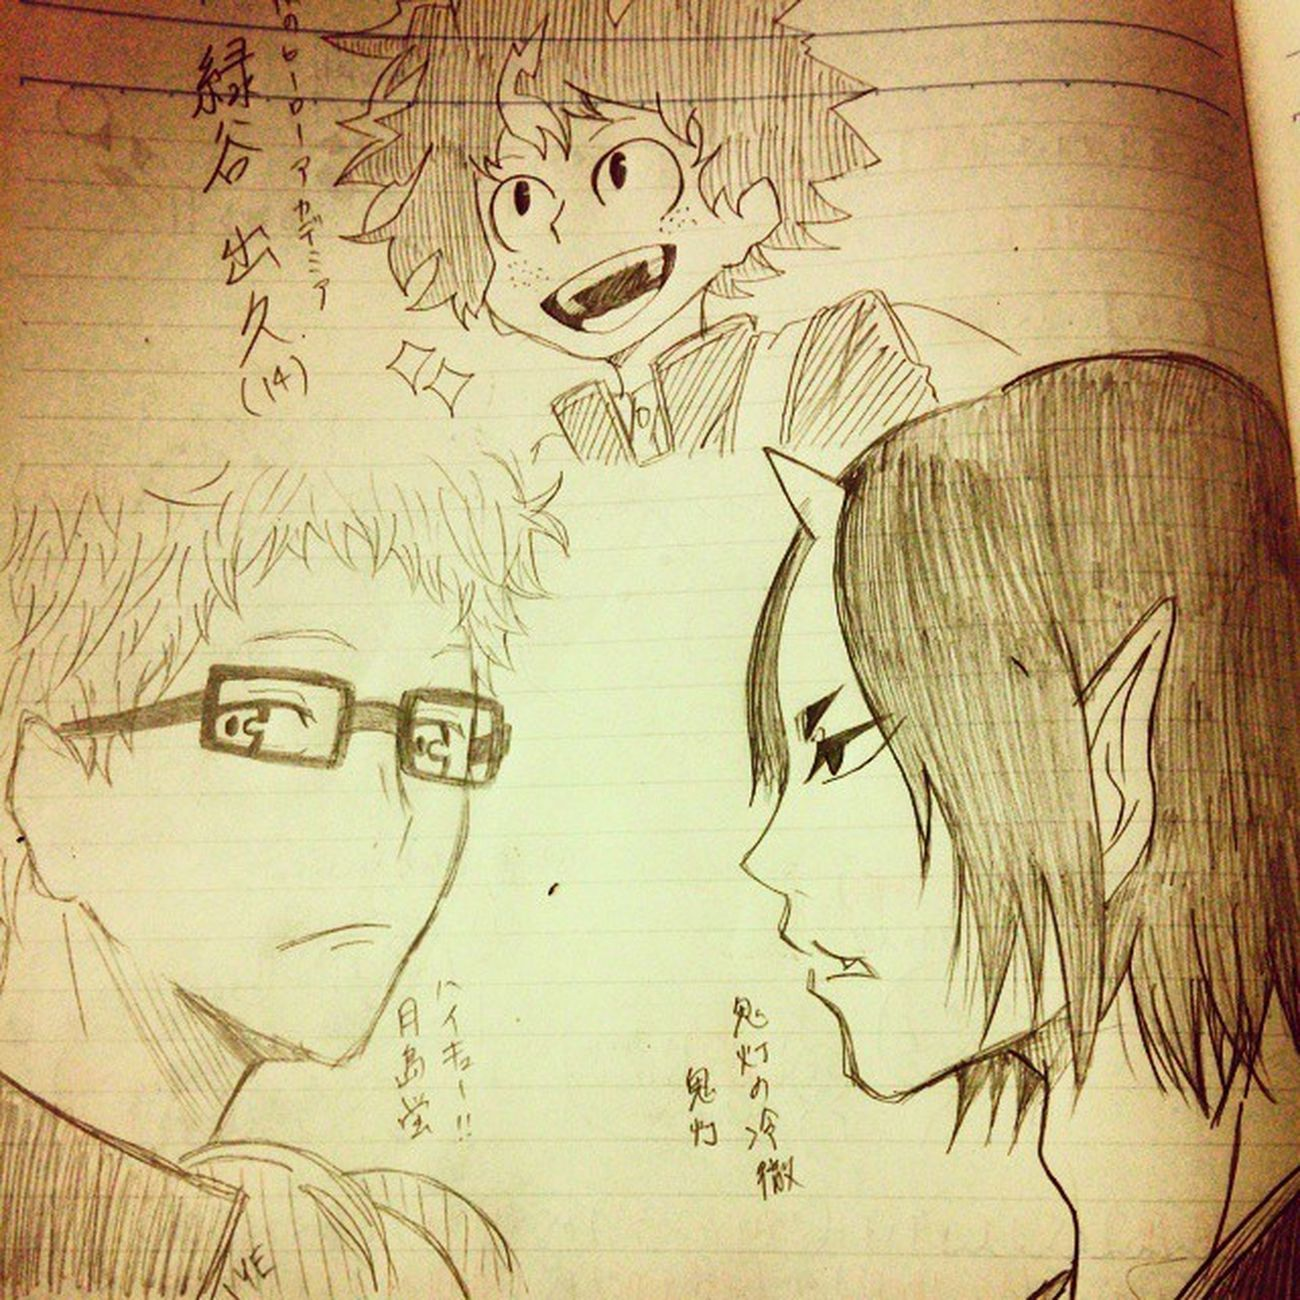 Hq My Hero Academia Cold Of Cherry Illust ハイキュー!! 僕のヒーローアカデミア 鬼灯の冷徹 絵